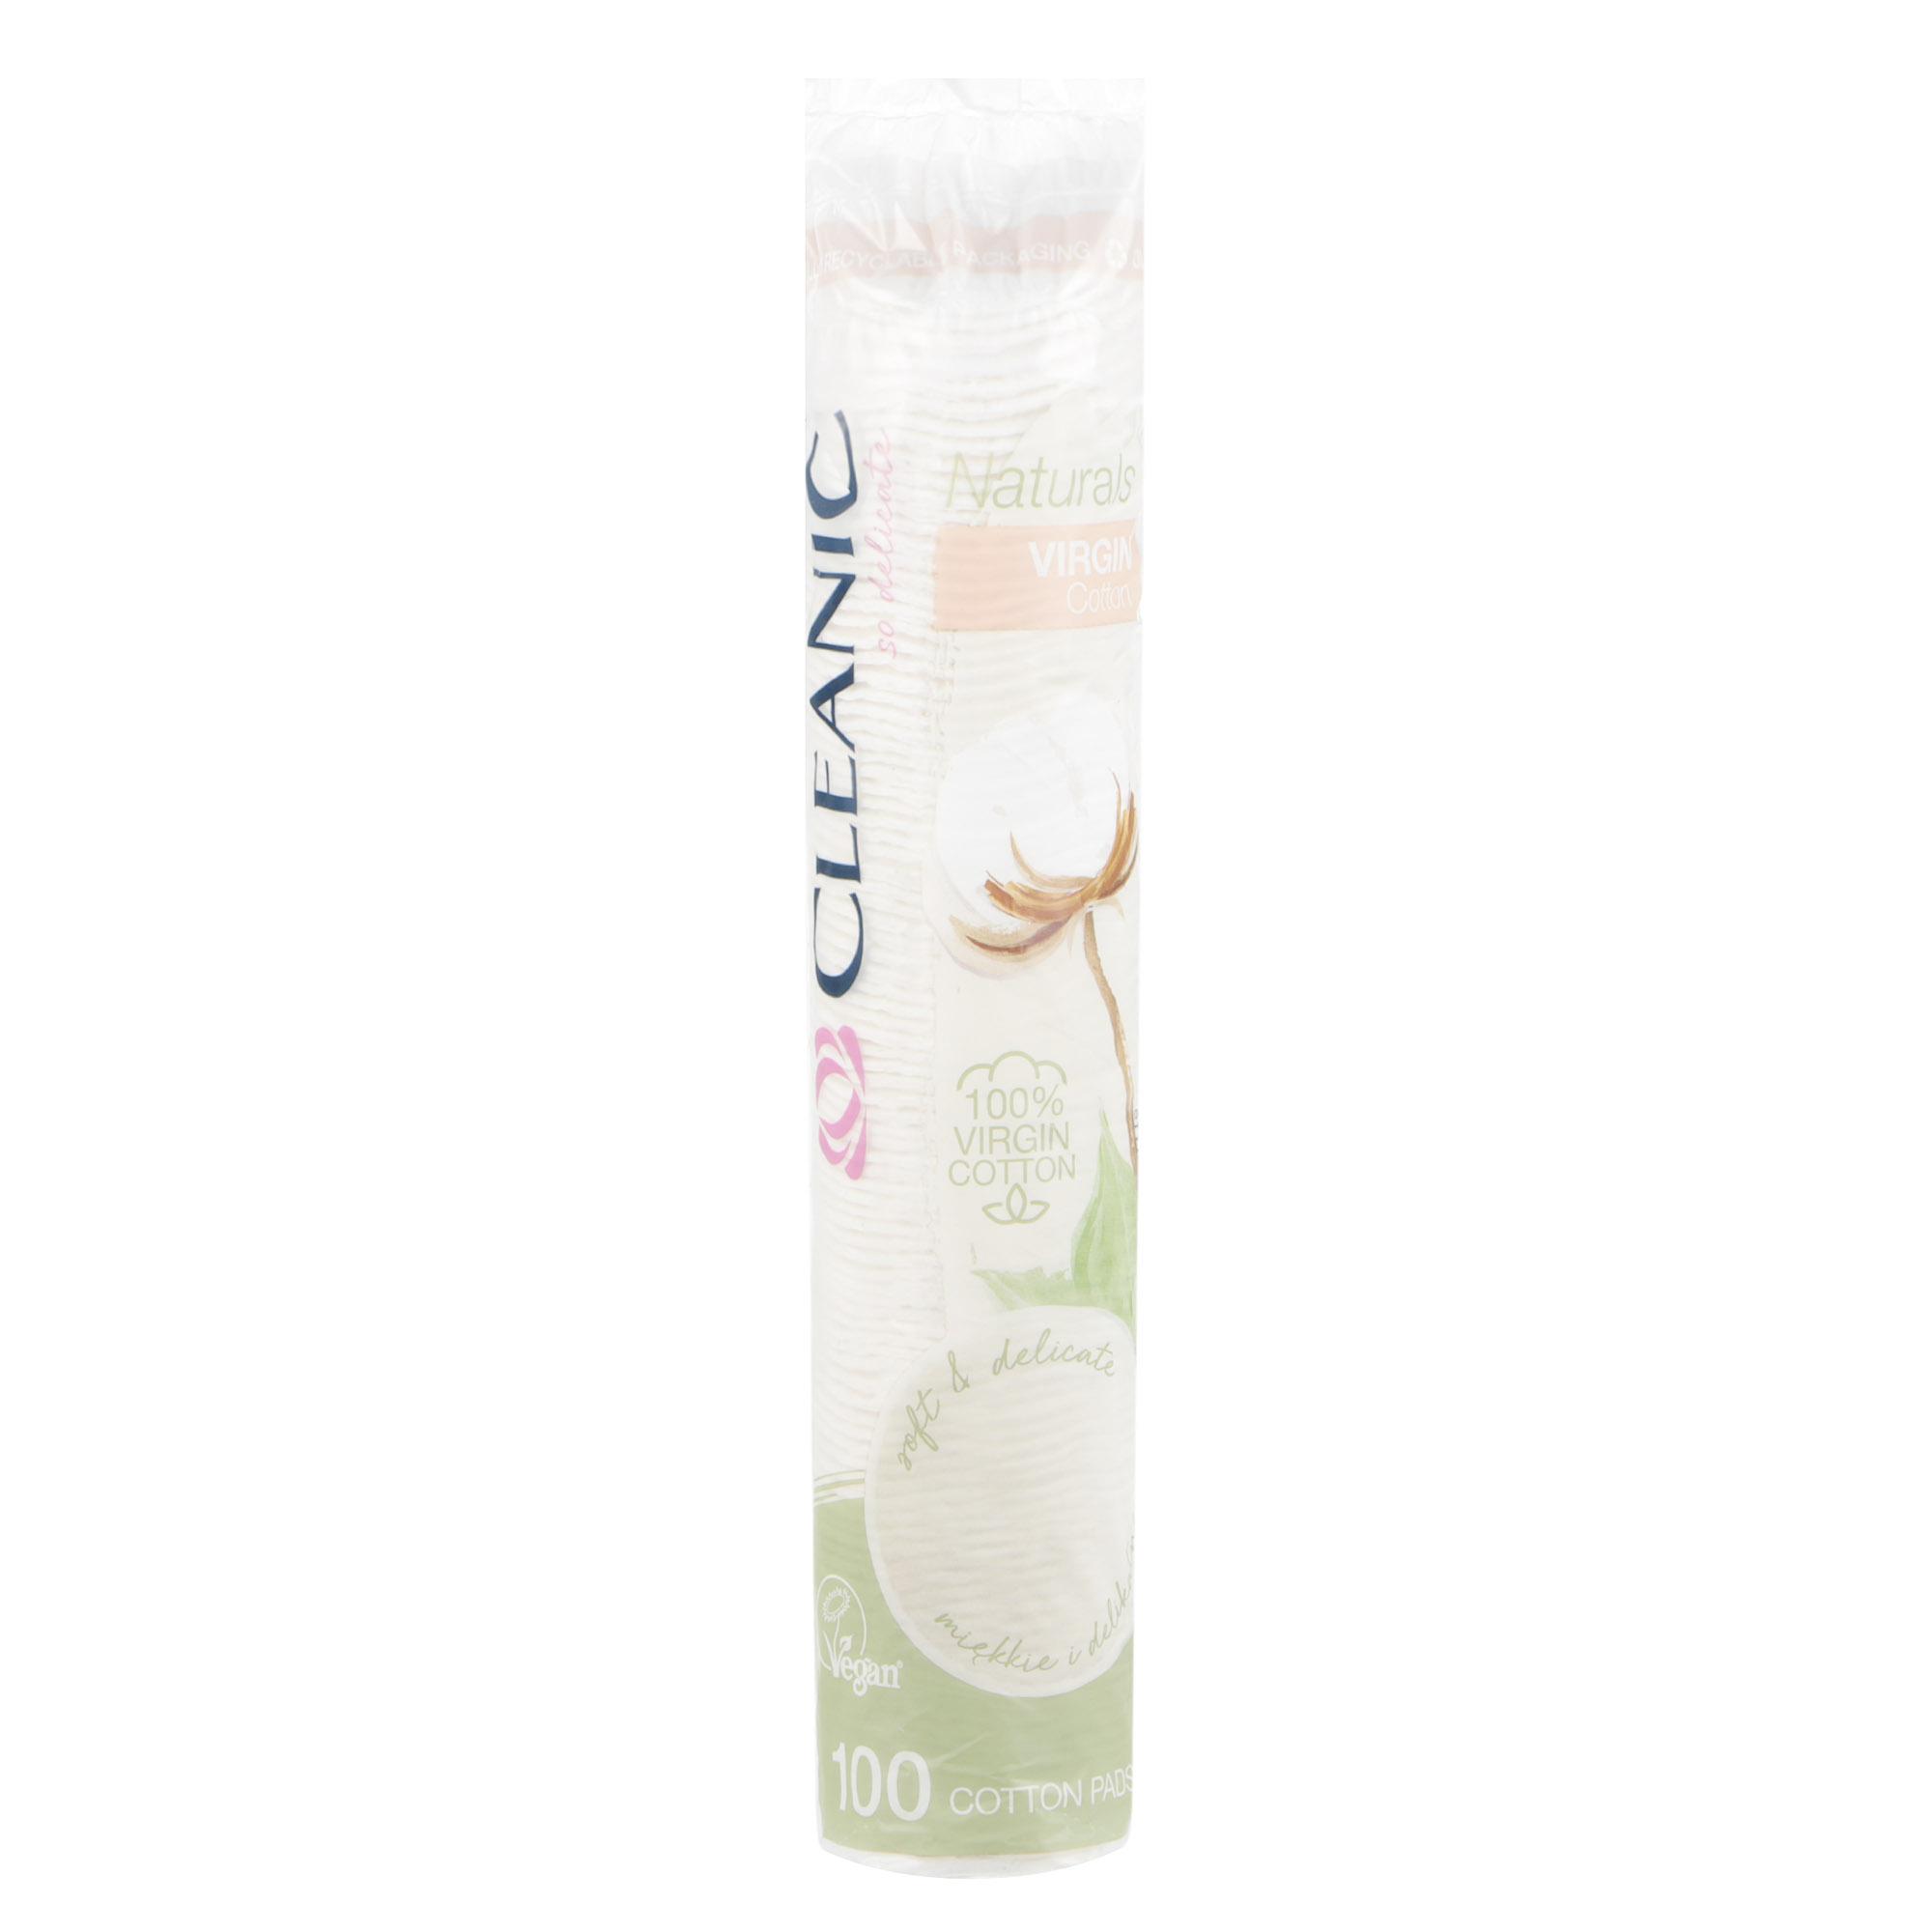 Ватные диски Cleanic Naturals Virgin Cotton 100 шт